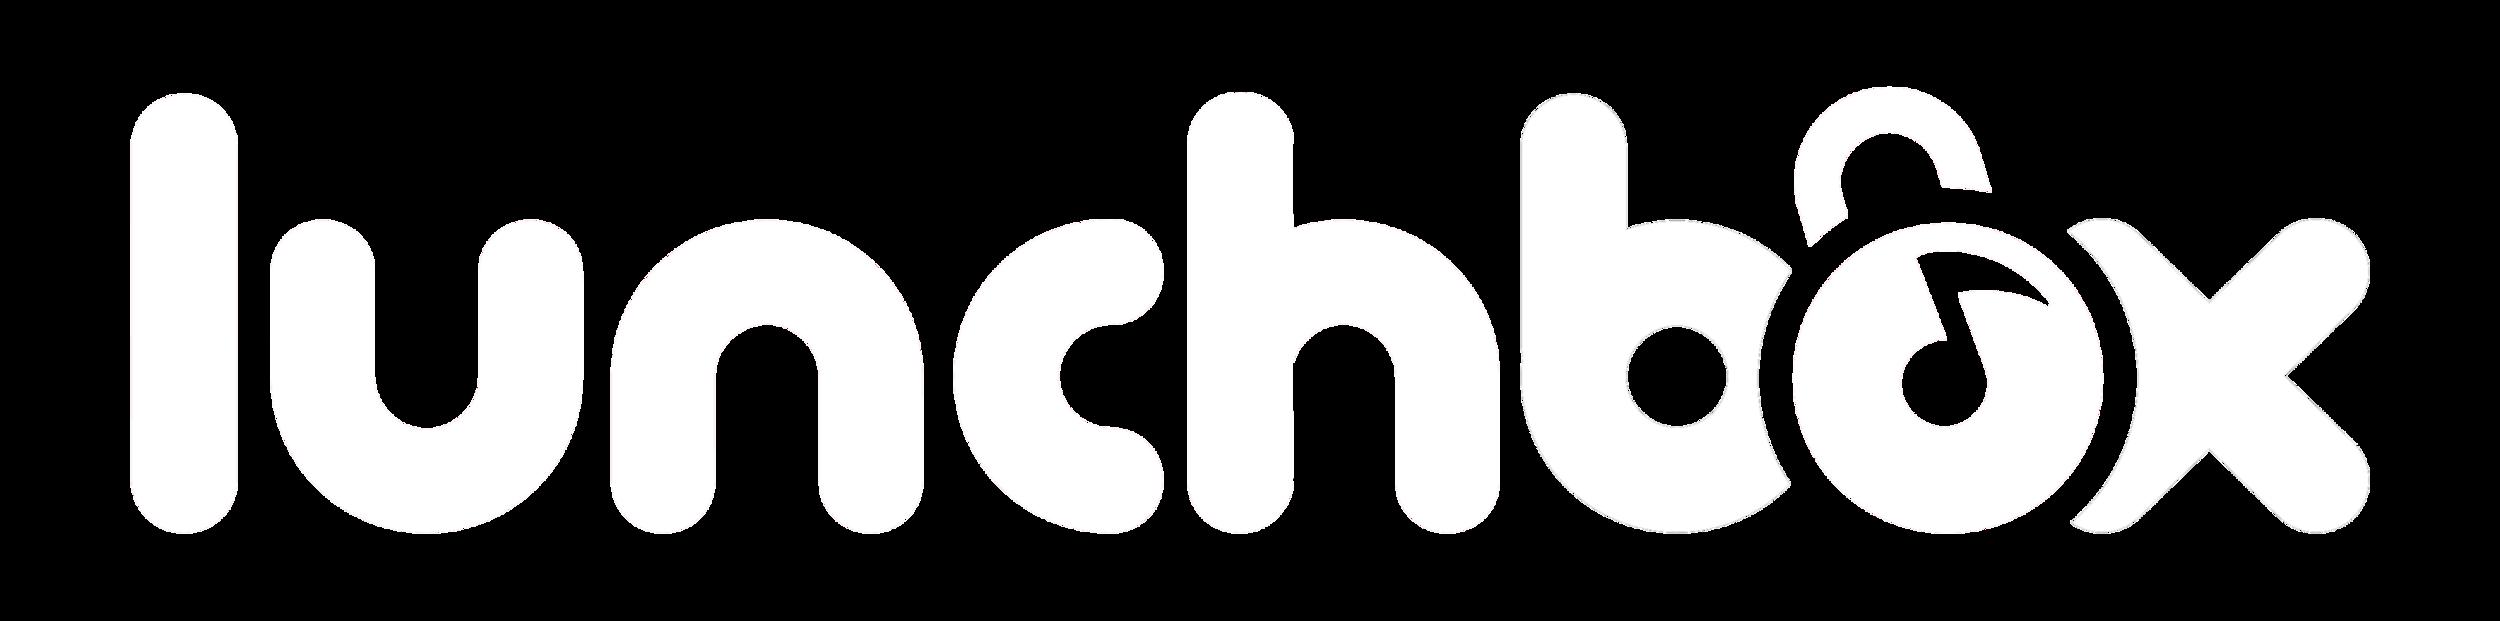 Logo design for The Redhead restaurant